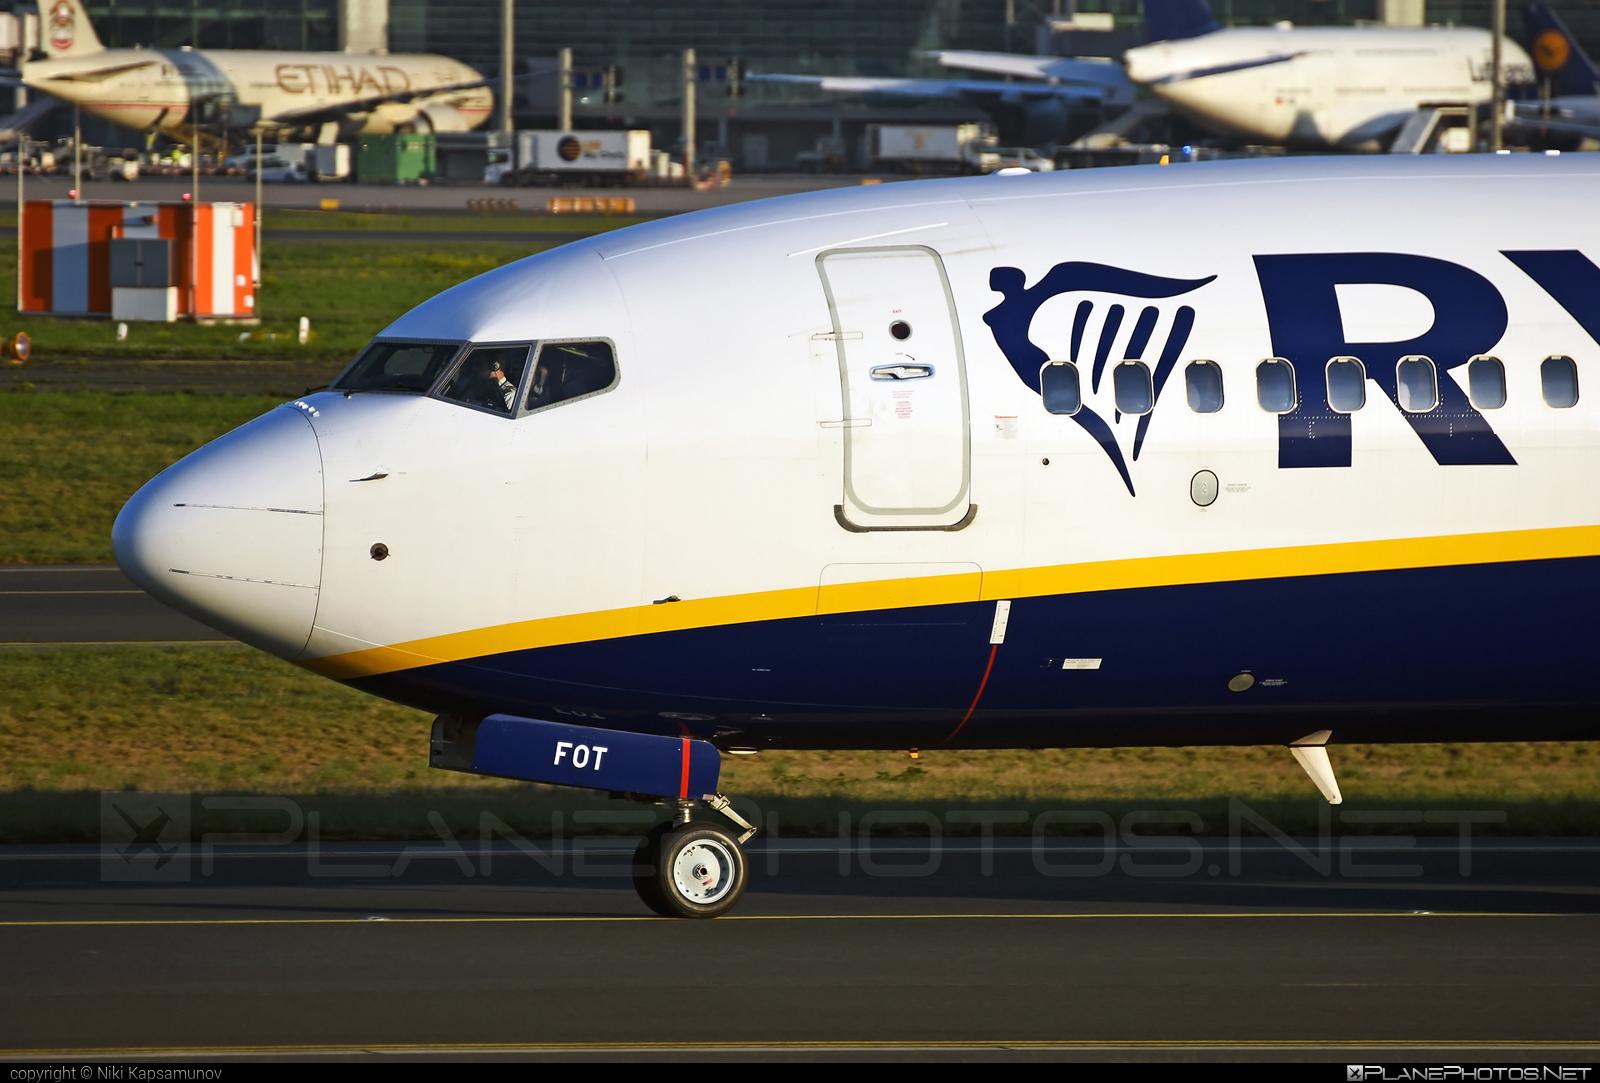 Boeing 737-800 - EI-FOT operated by Ryanair #b737 #b737nextgen #b737ng #boeing #boeing737 #ryanair